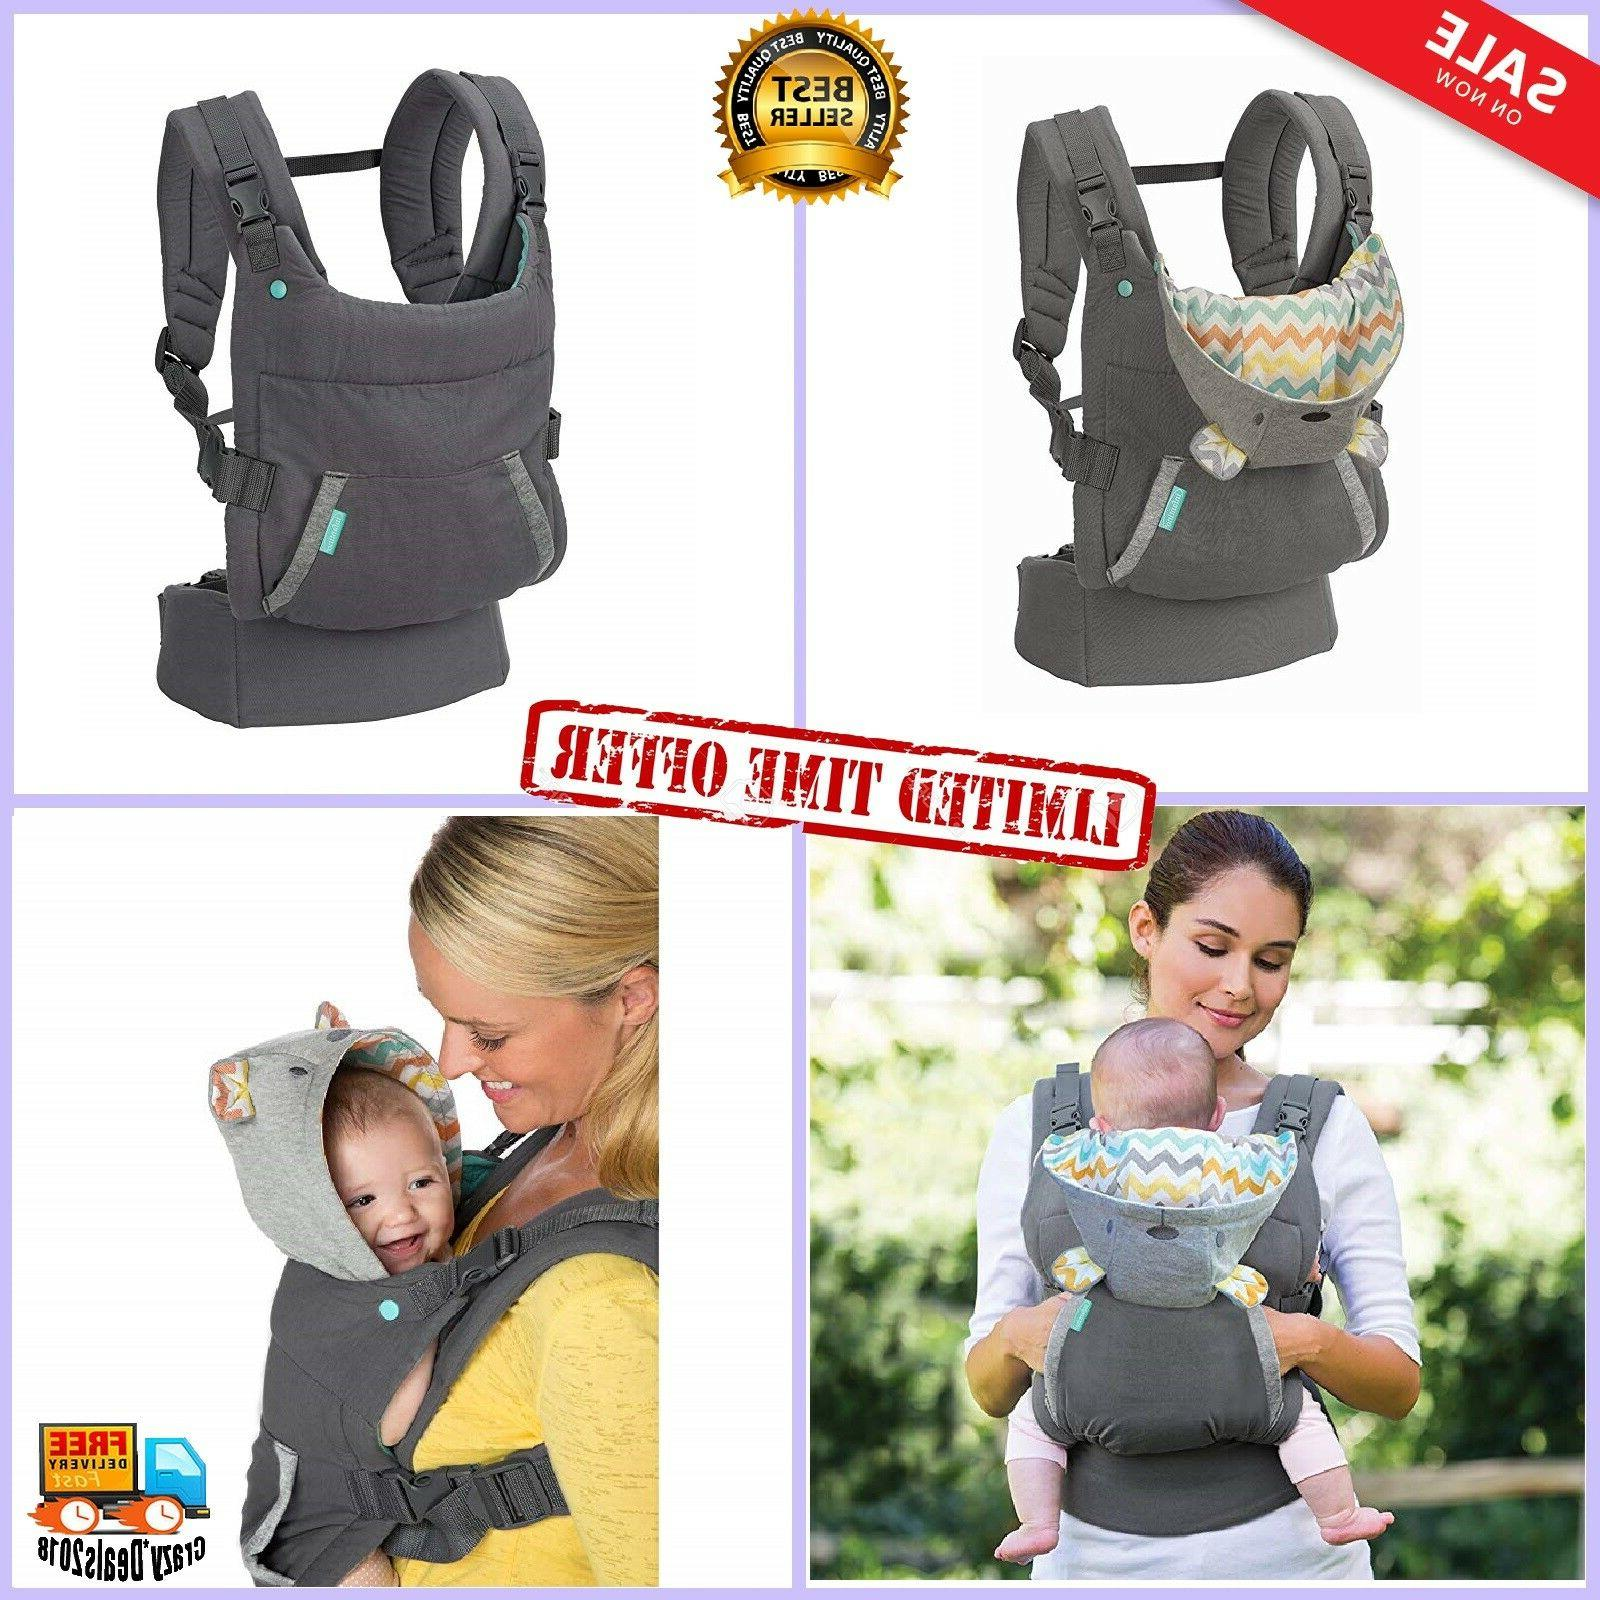 Infantino Newborn Baby Carrier Back Ergonomic seat adjustabl